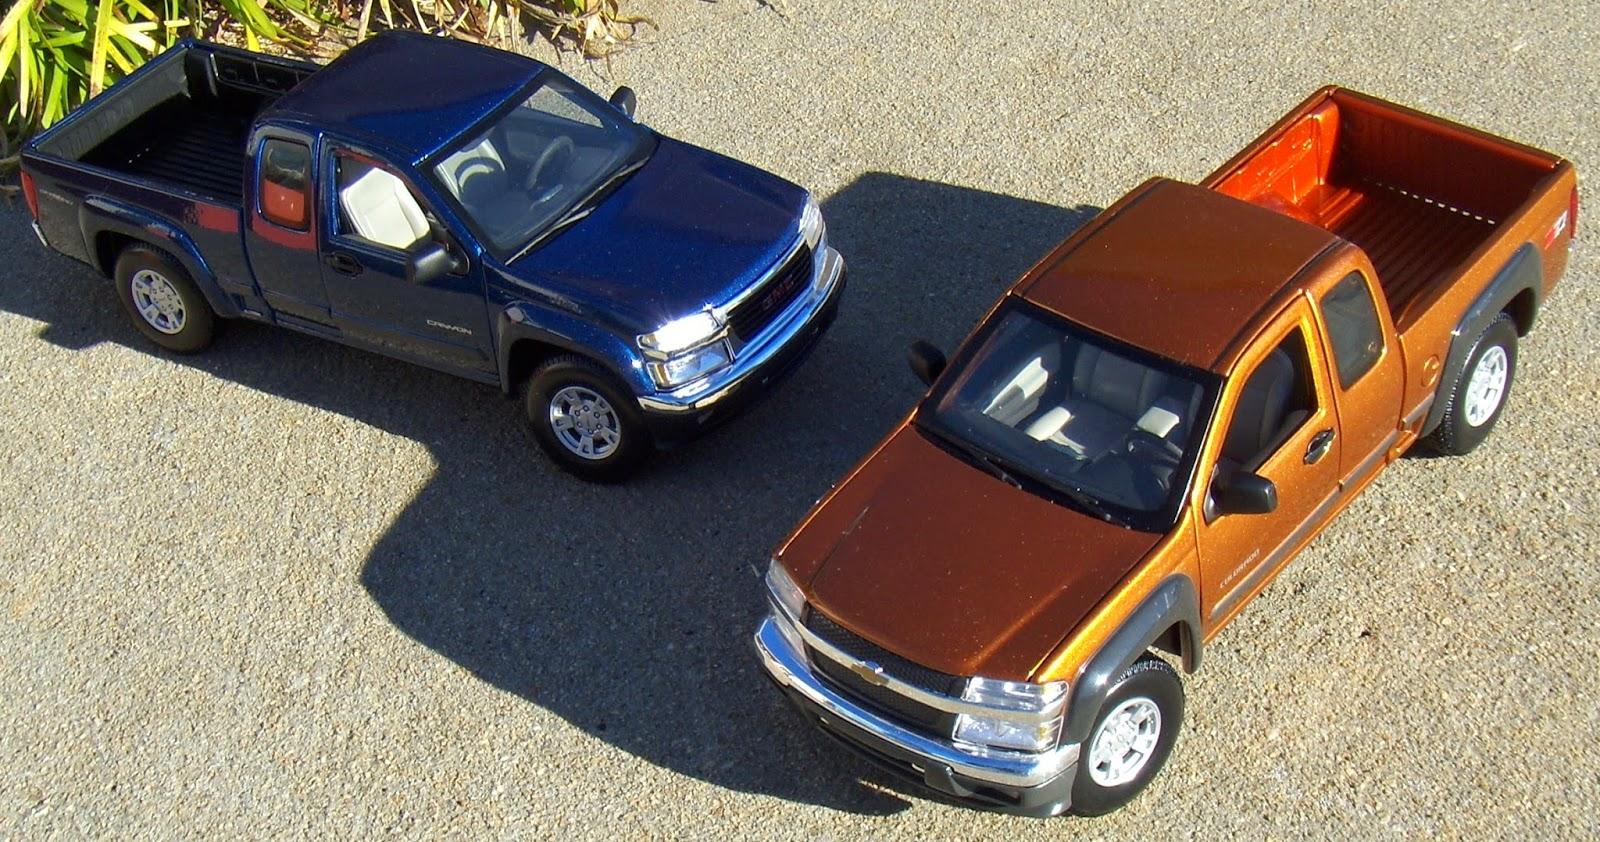 Bergey Used Cars Telford Pa